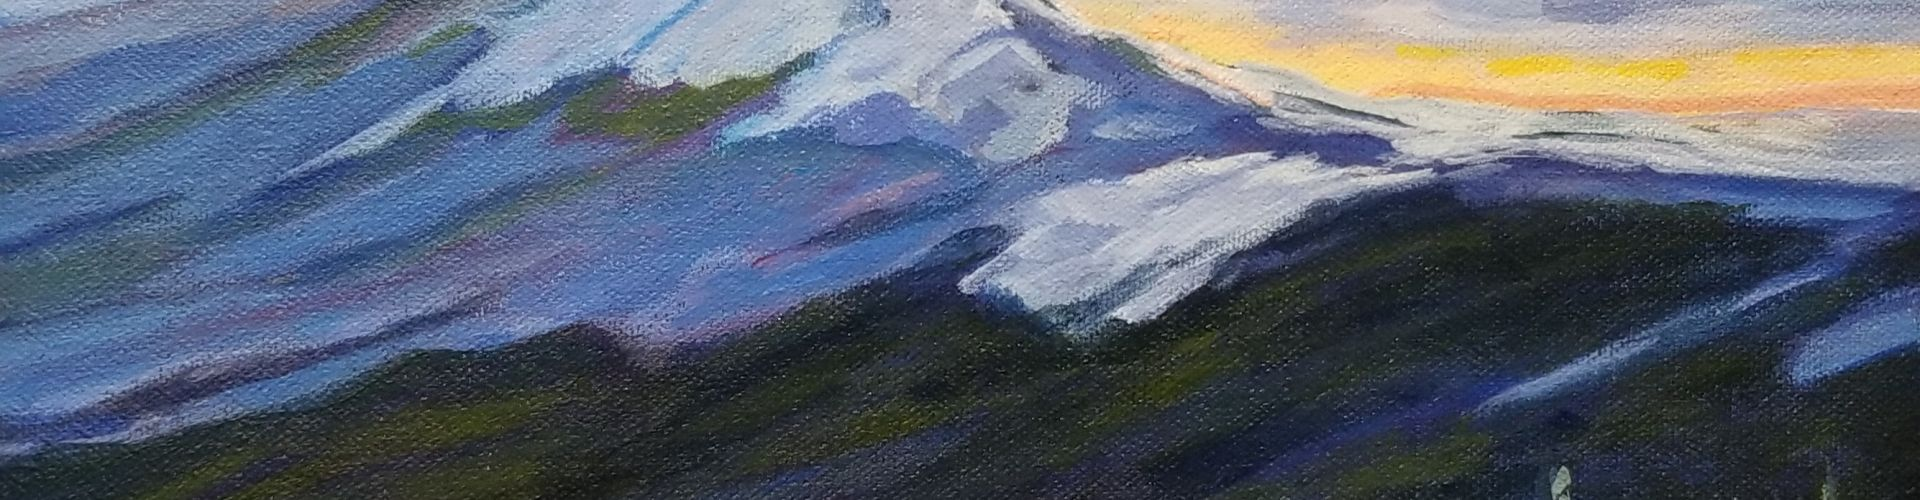 Sunset in Nakusp painting by Linda Lovisa